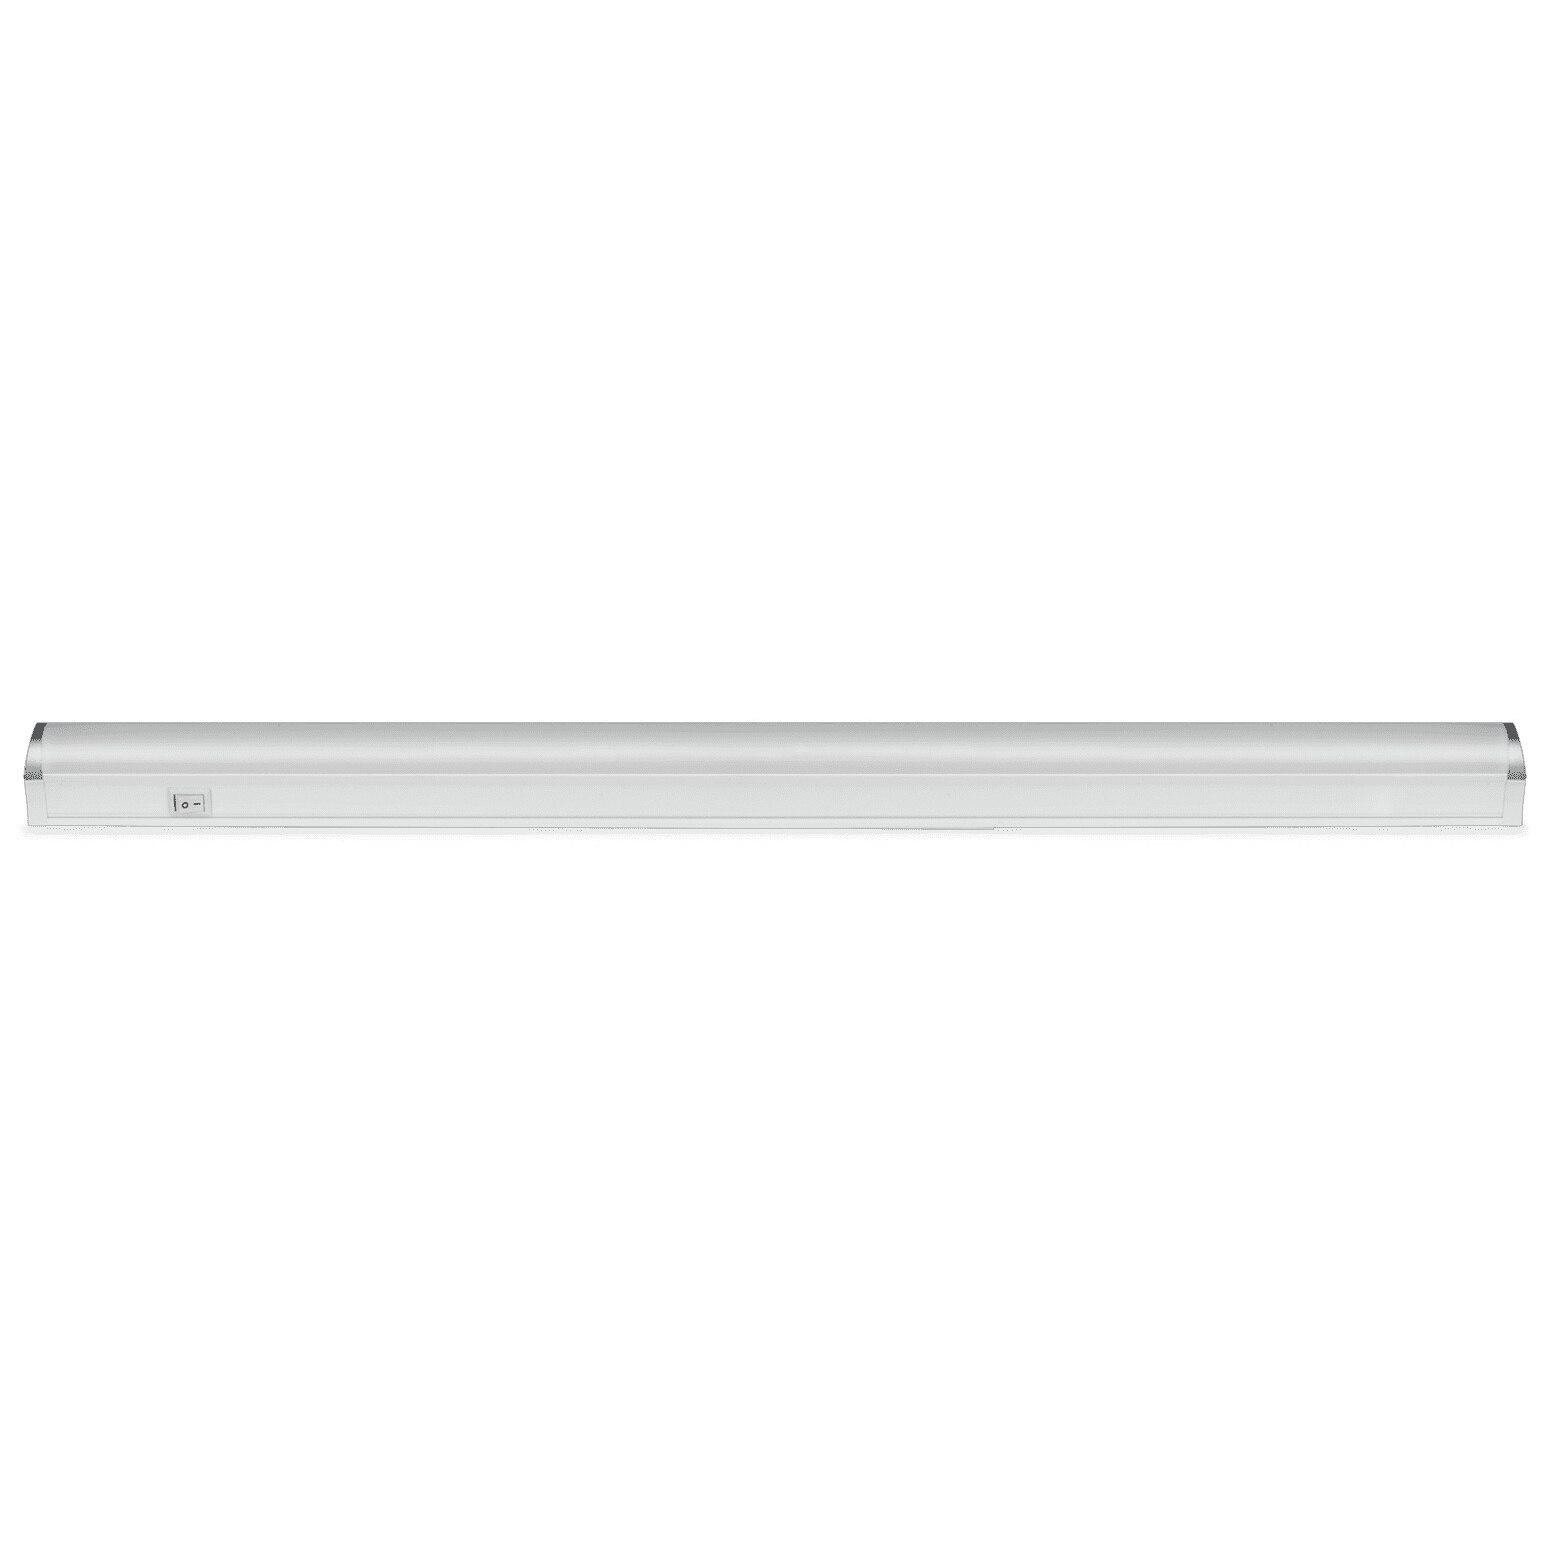 Downlight LED спб-t8-фито 14w 230v Ip40 1120mm For Plant Growth 4690612008790